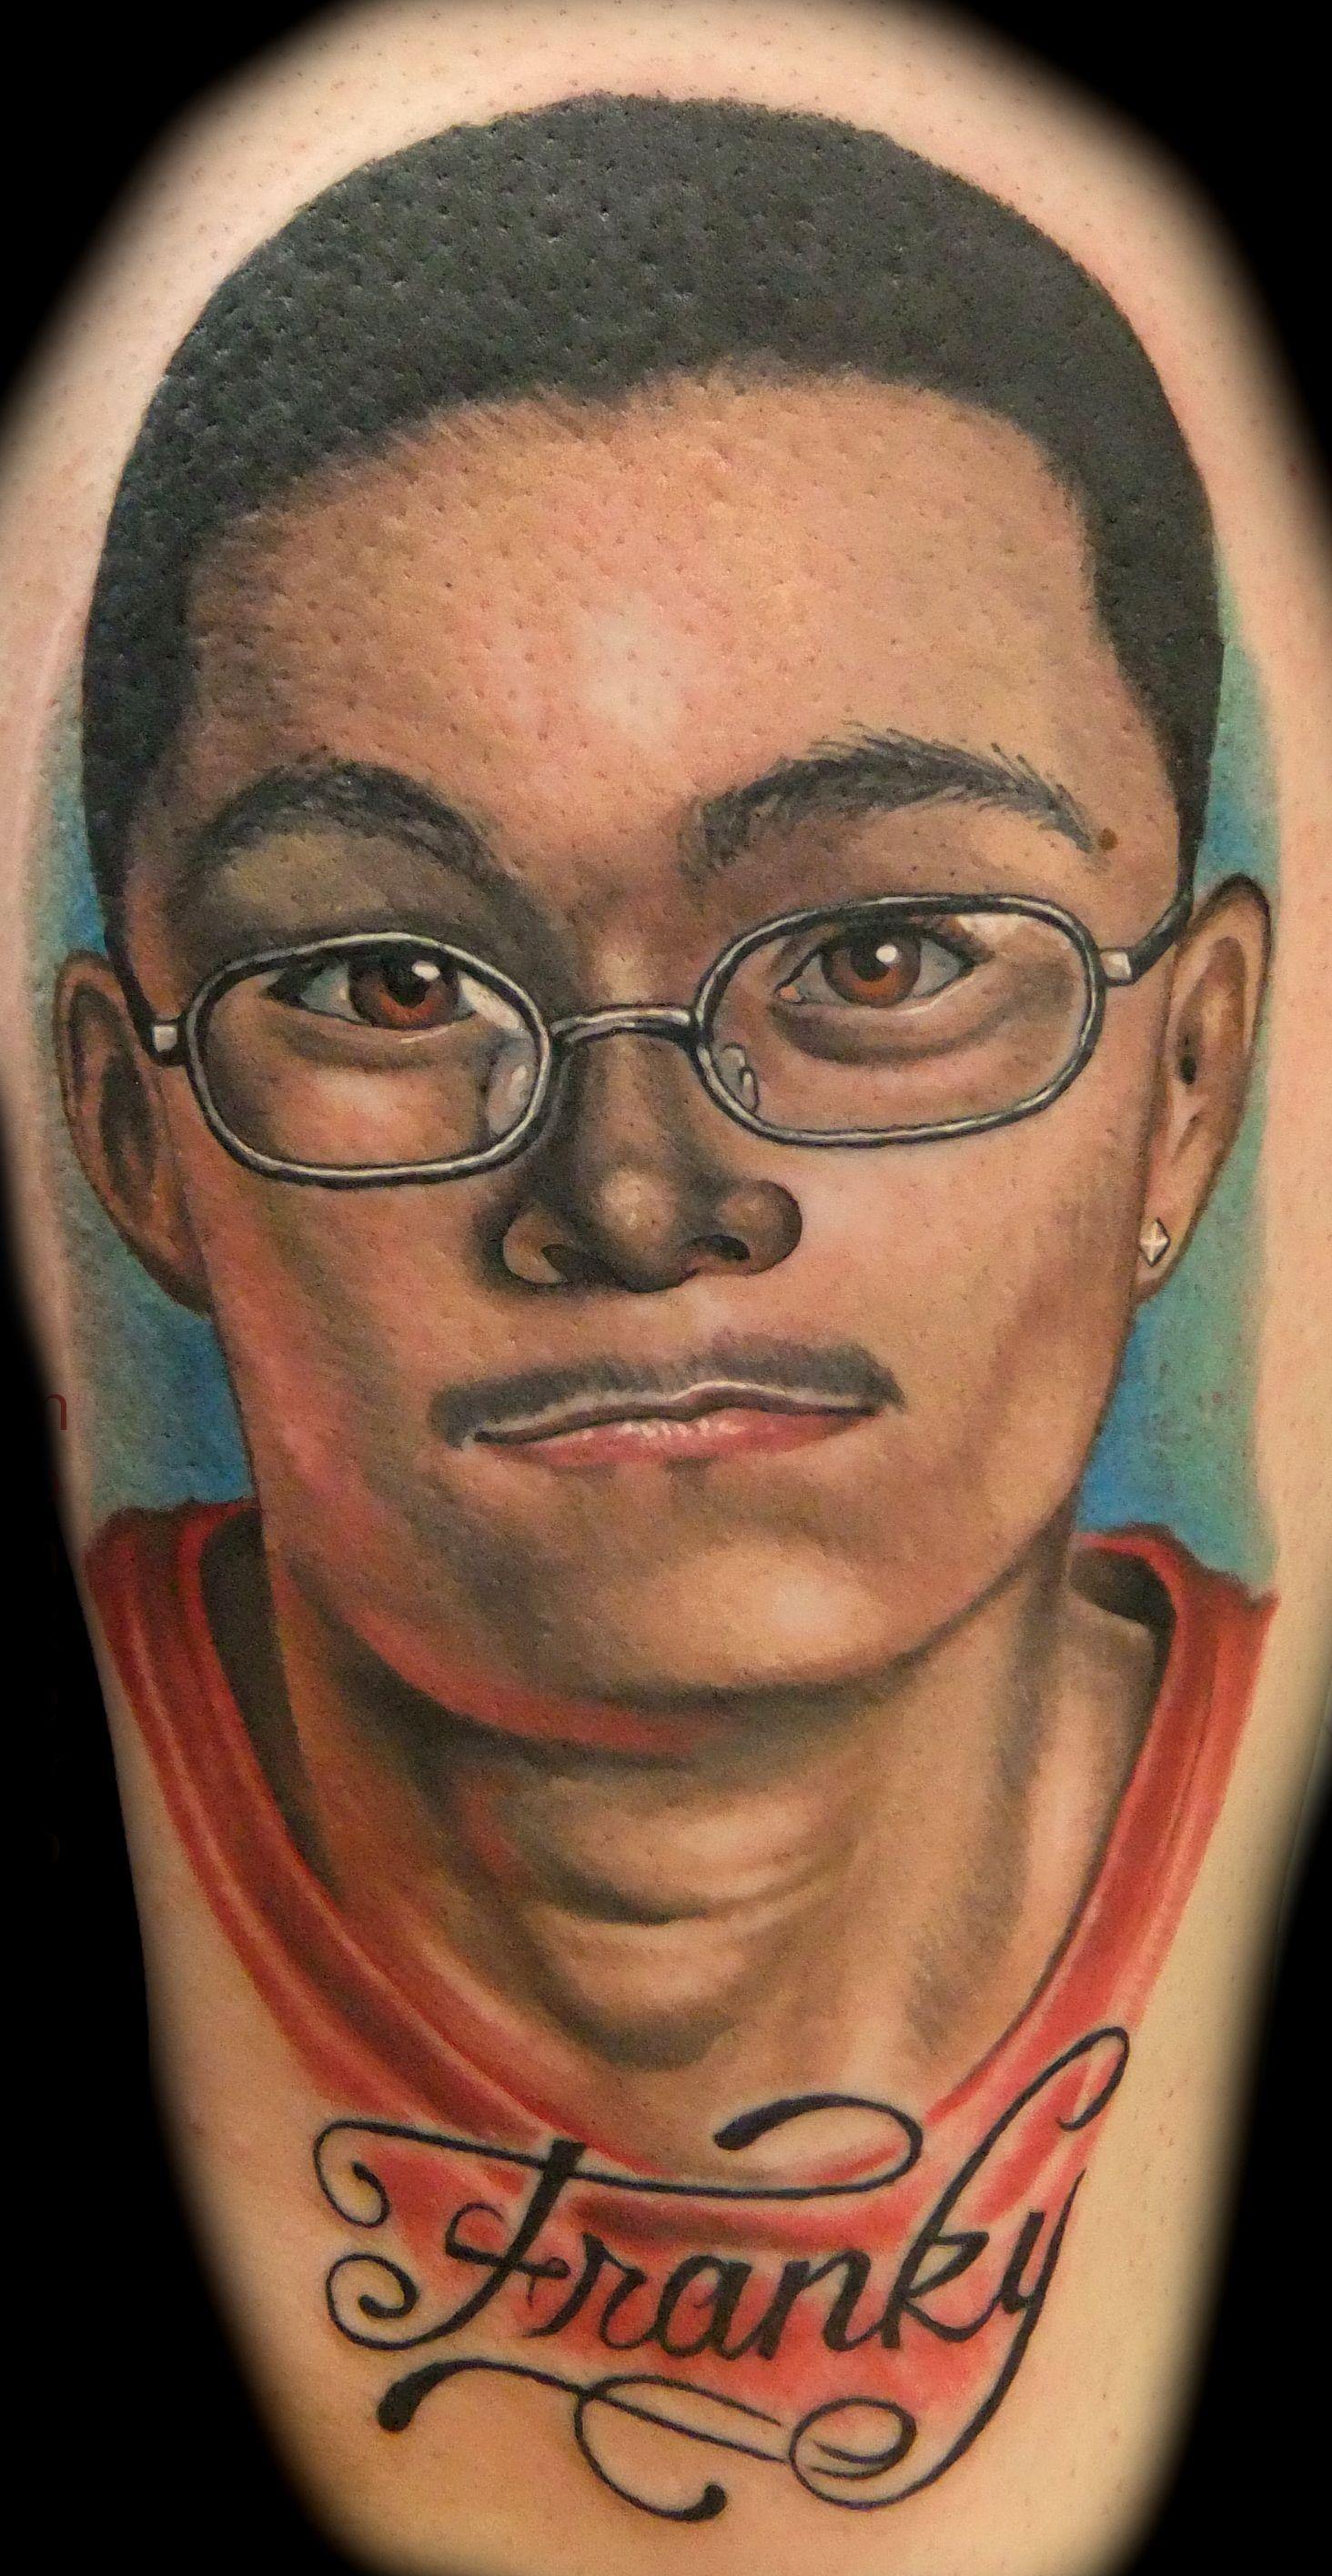 Portrait brother realistic tattoos chicago tattoos tattoos